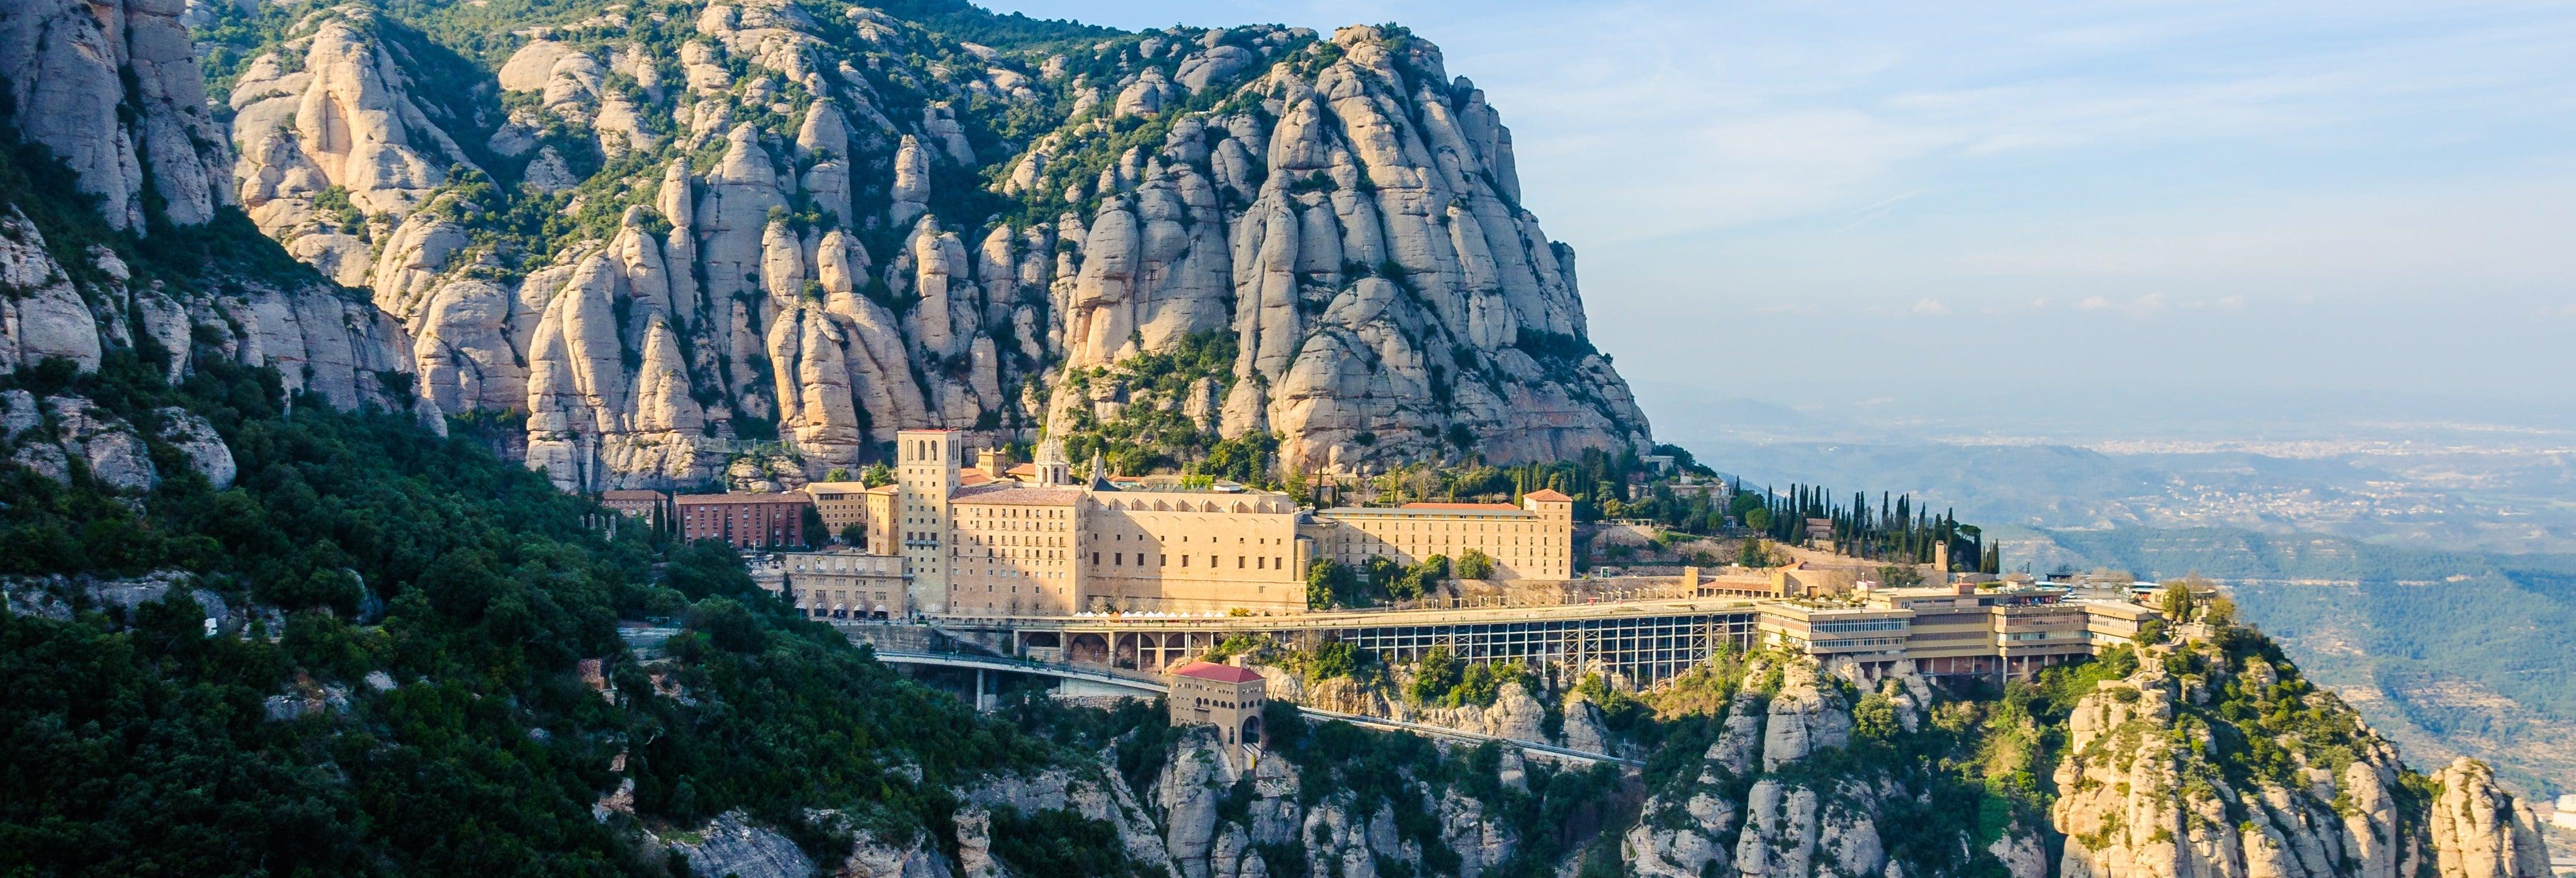 Excursão a Montserrat